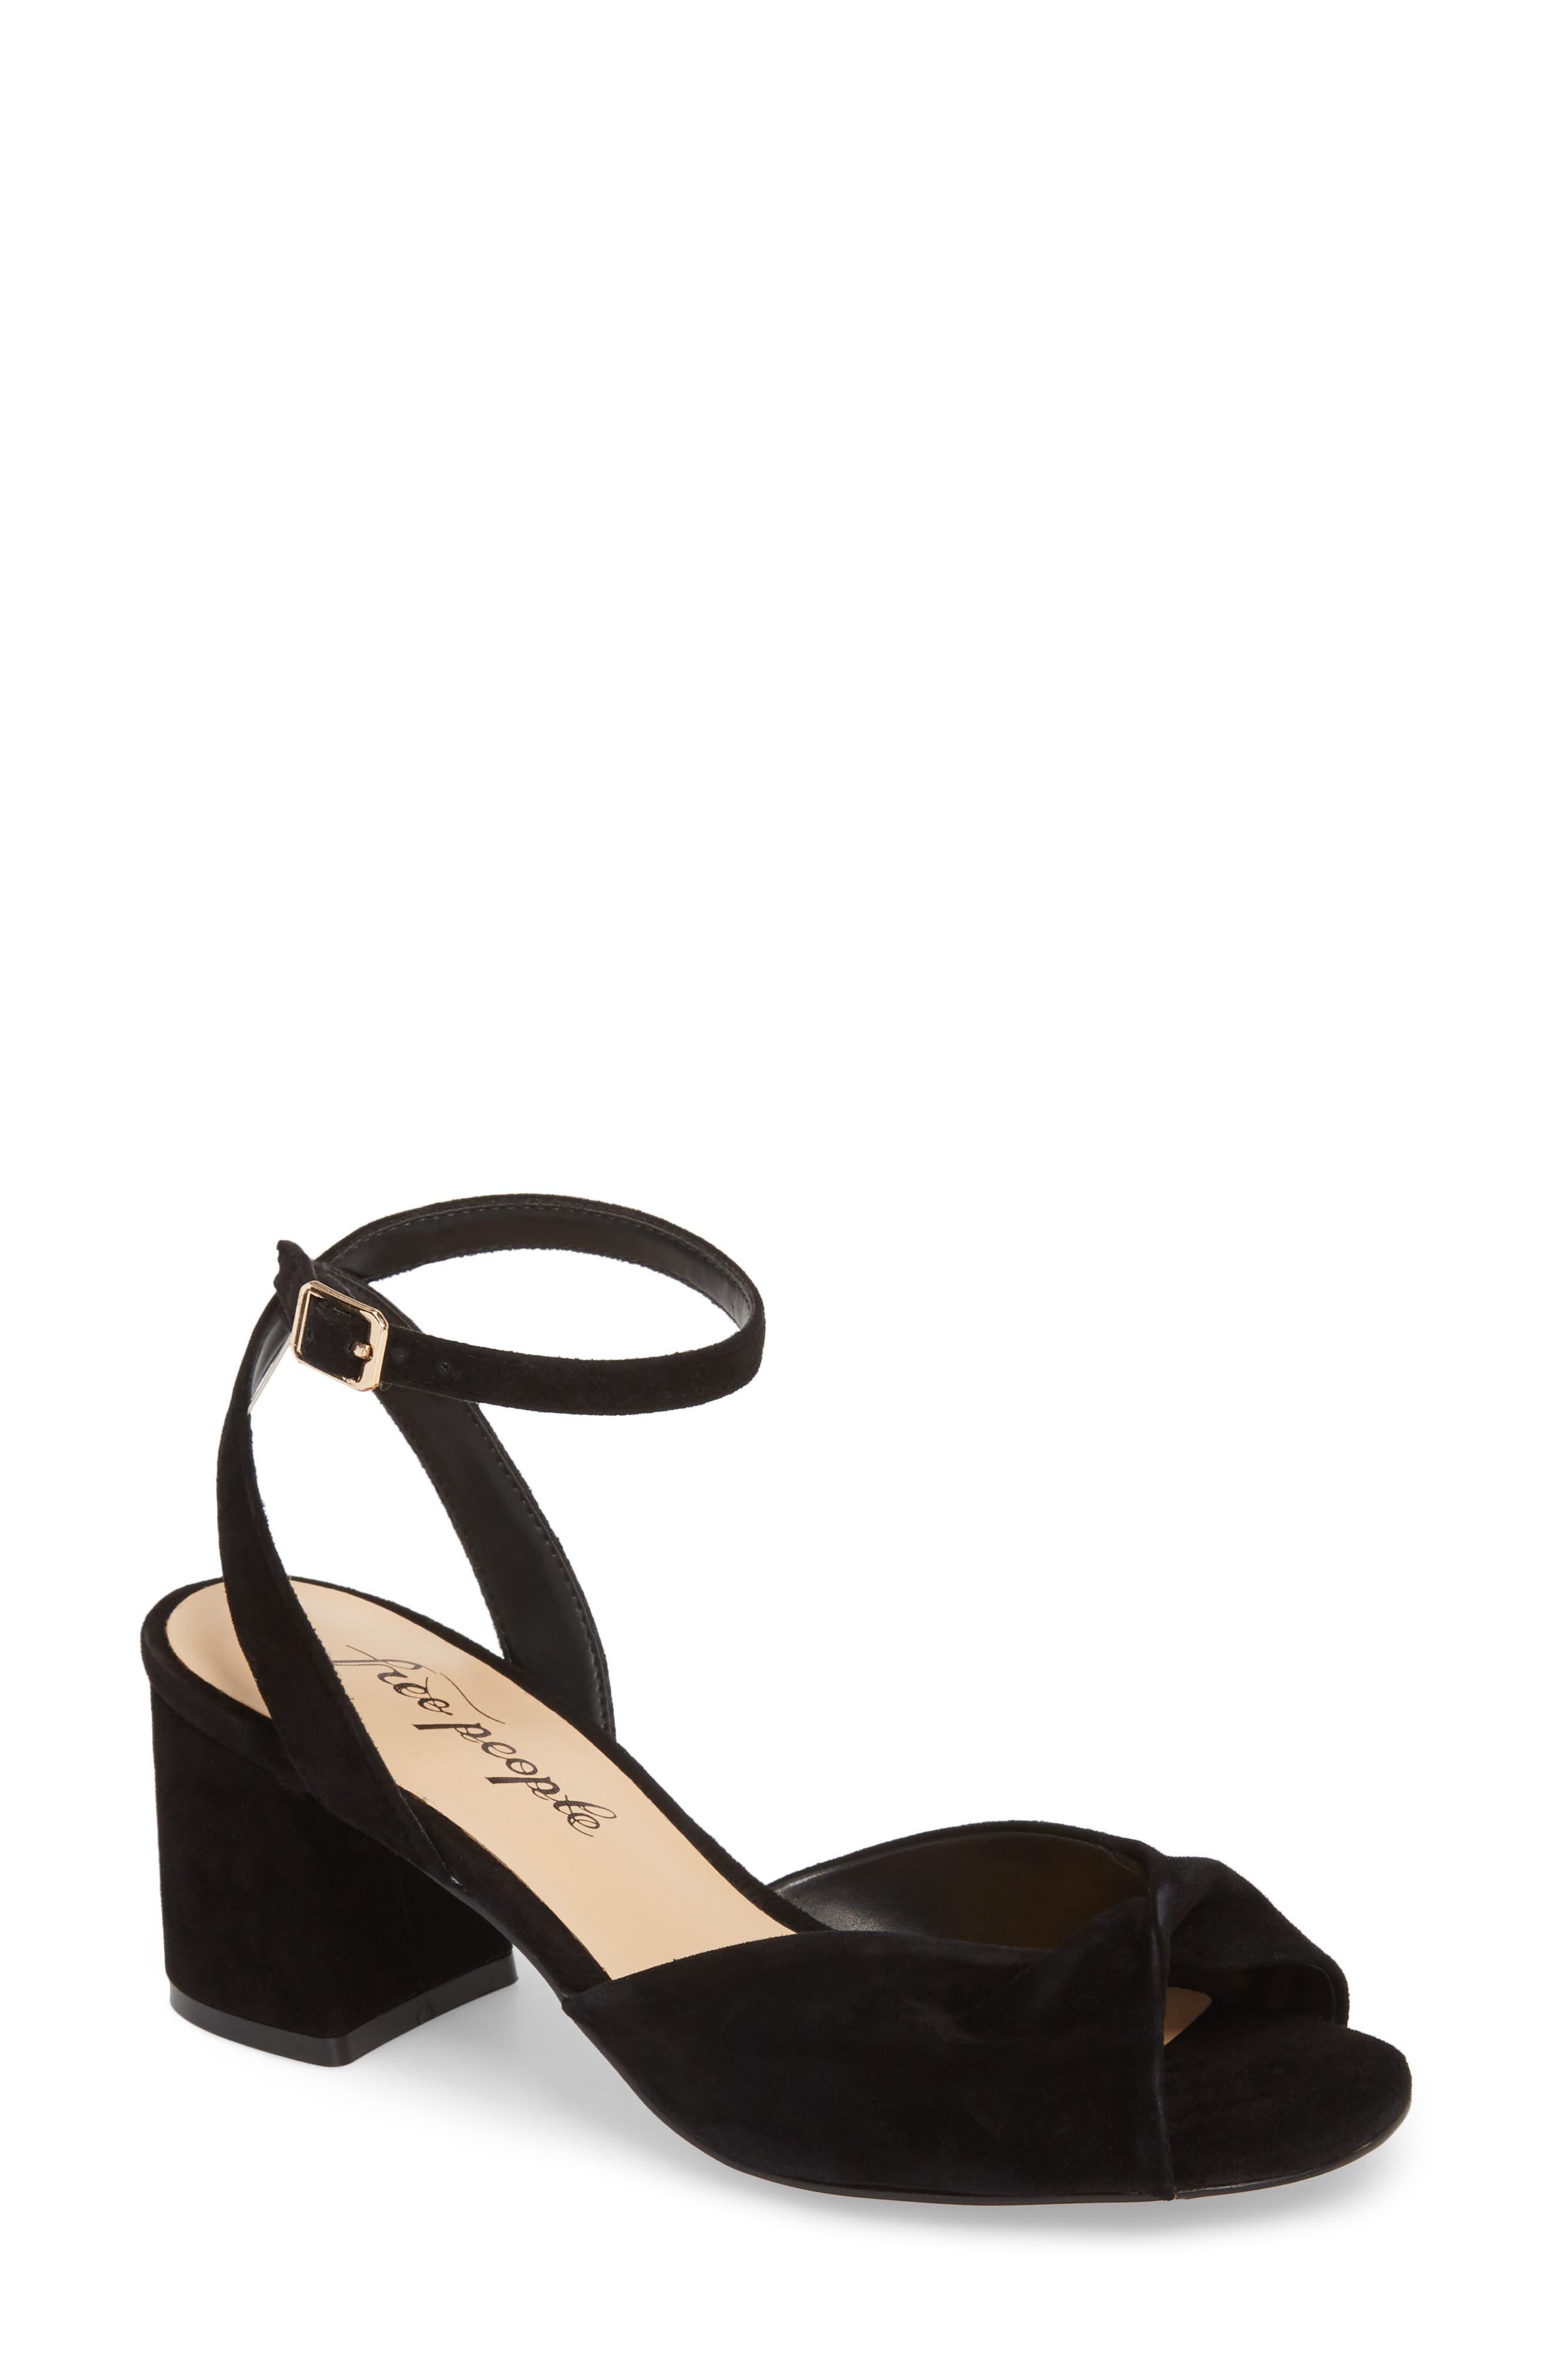 Gisele Twisted Sandal,                         Main,                         color, 001